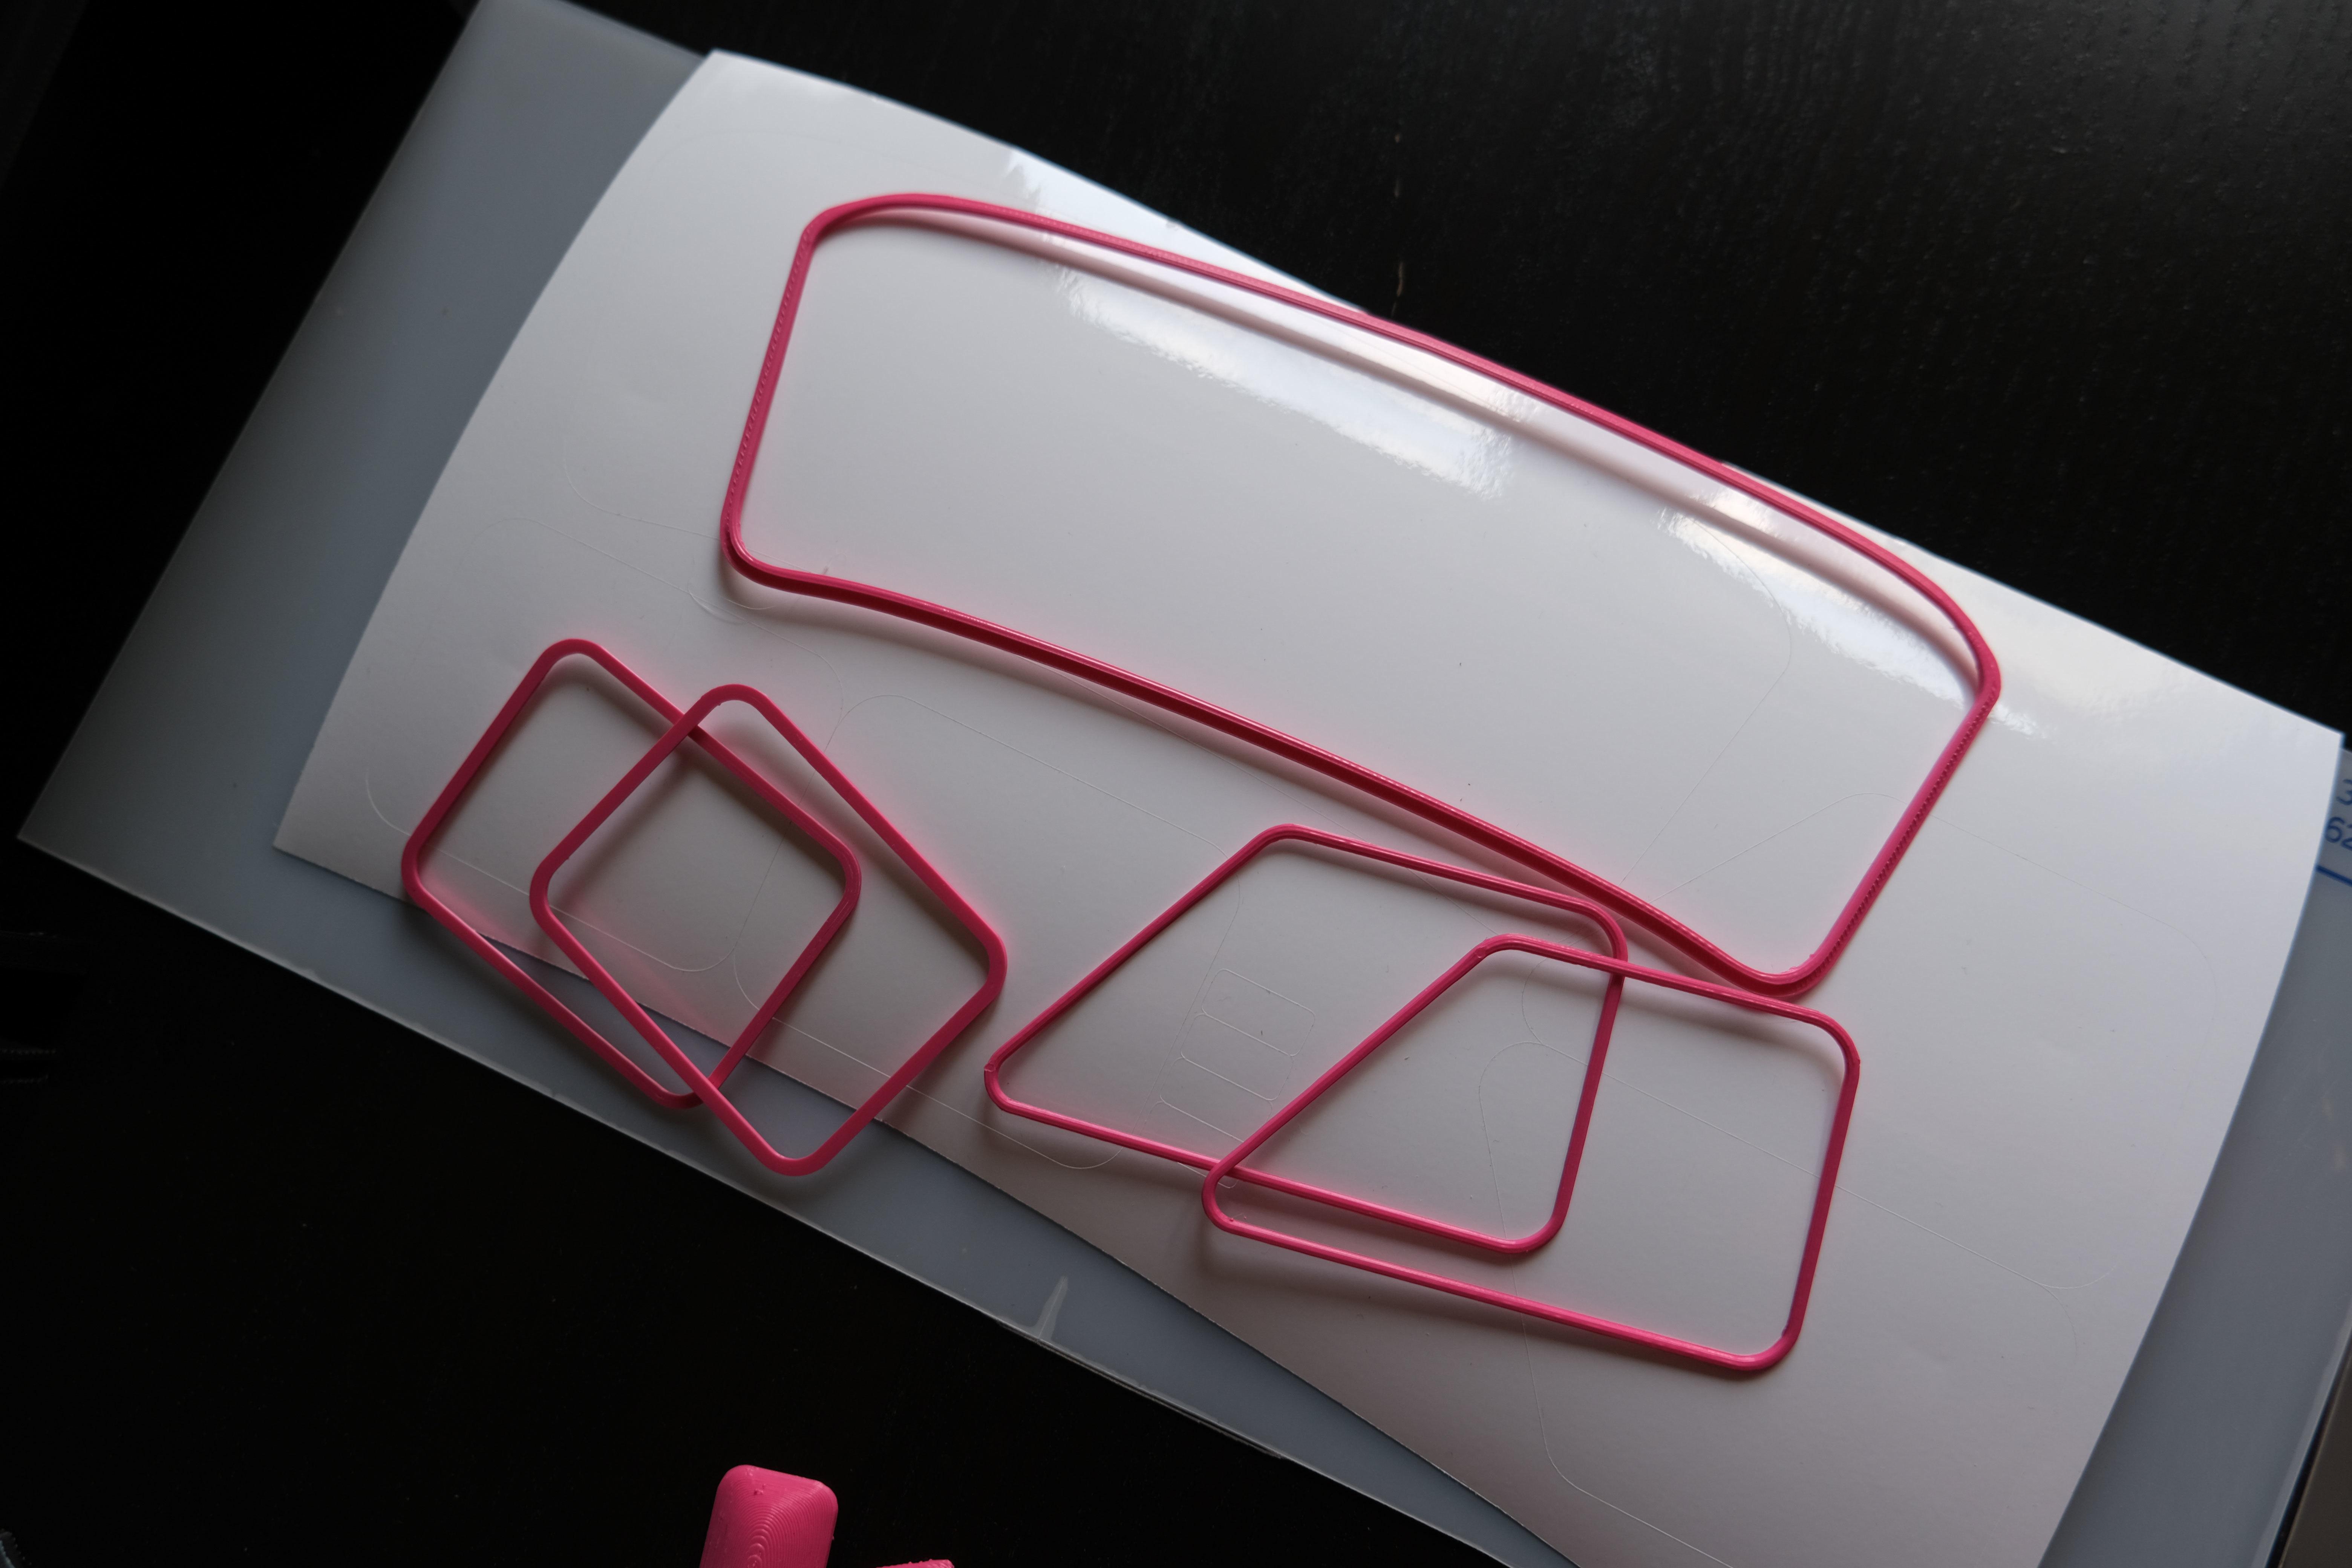 chevy-van-g20-3d-printed-3.jpg Descargar archivo STL CHEVY VAN G20 RC BODY SCALER AXIAL MST TRX4 RC4WD • Modelo para imprimir en 3D, ilyakapitonov